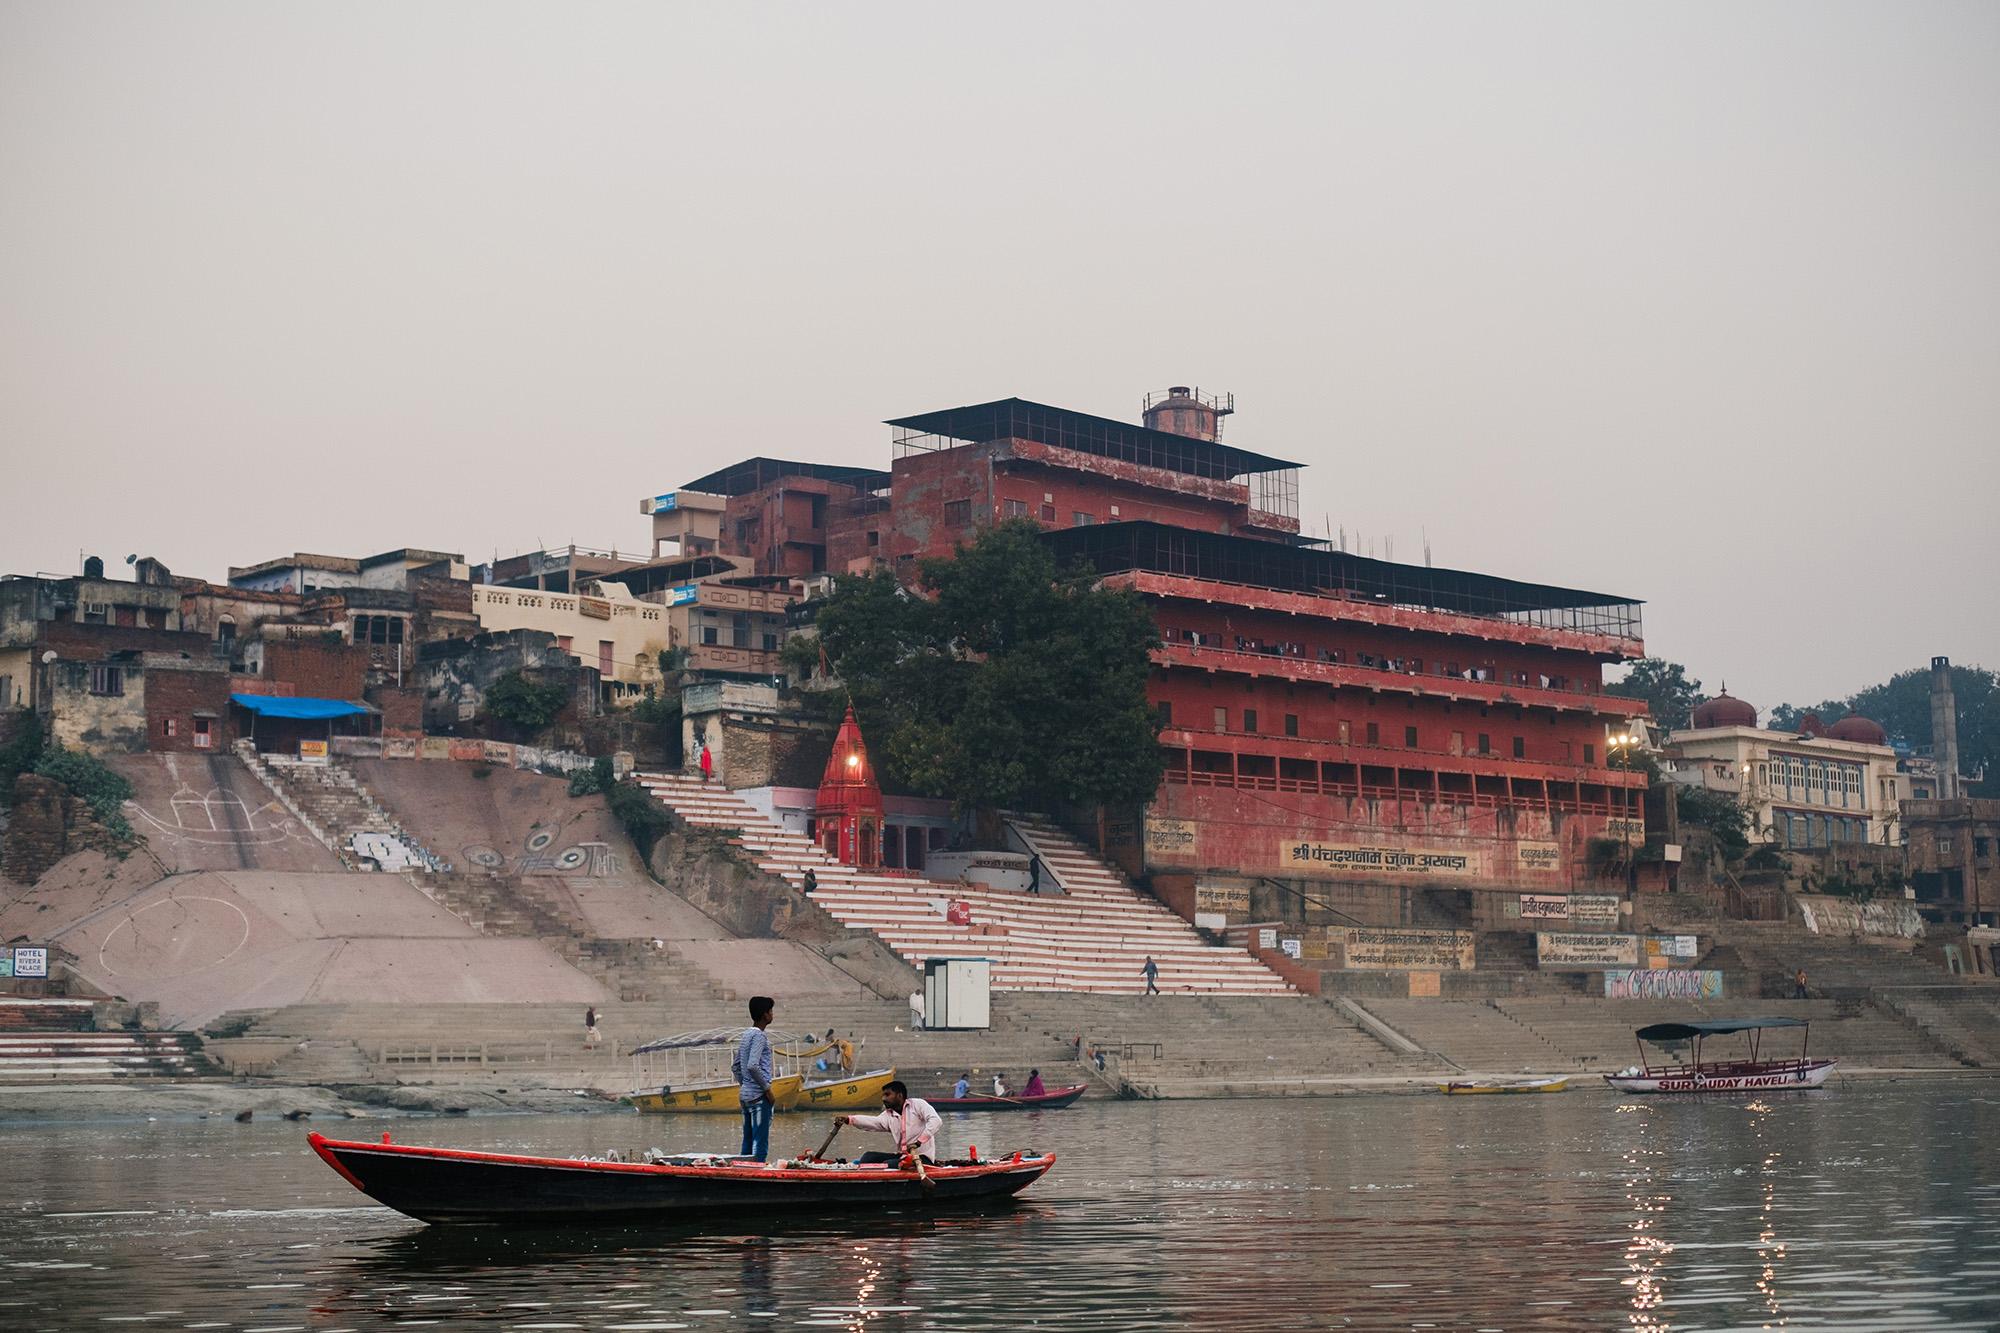 AnjaPoehlmann_India-Varanasi_110.jpg